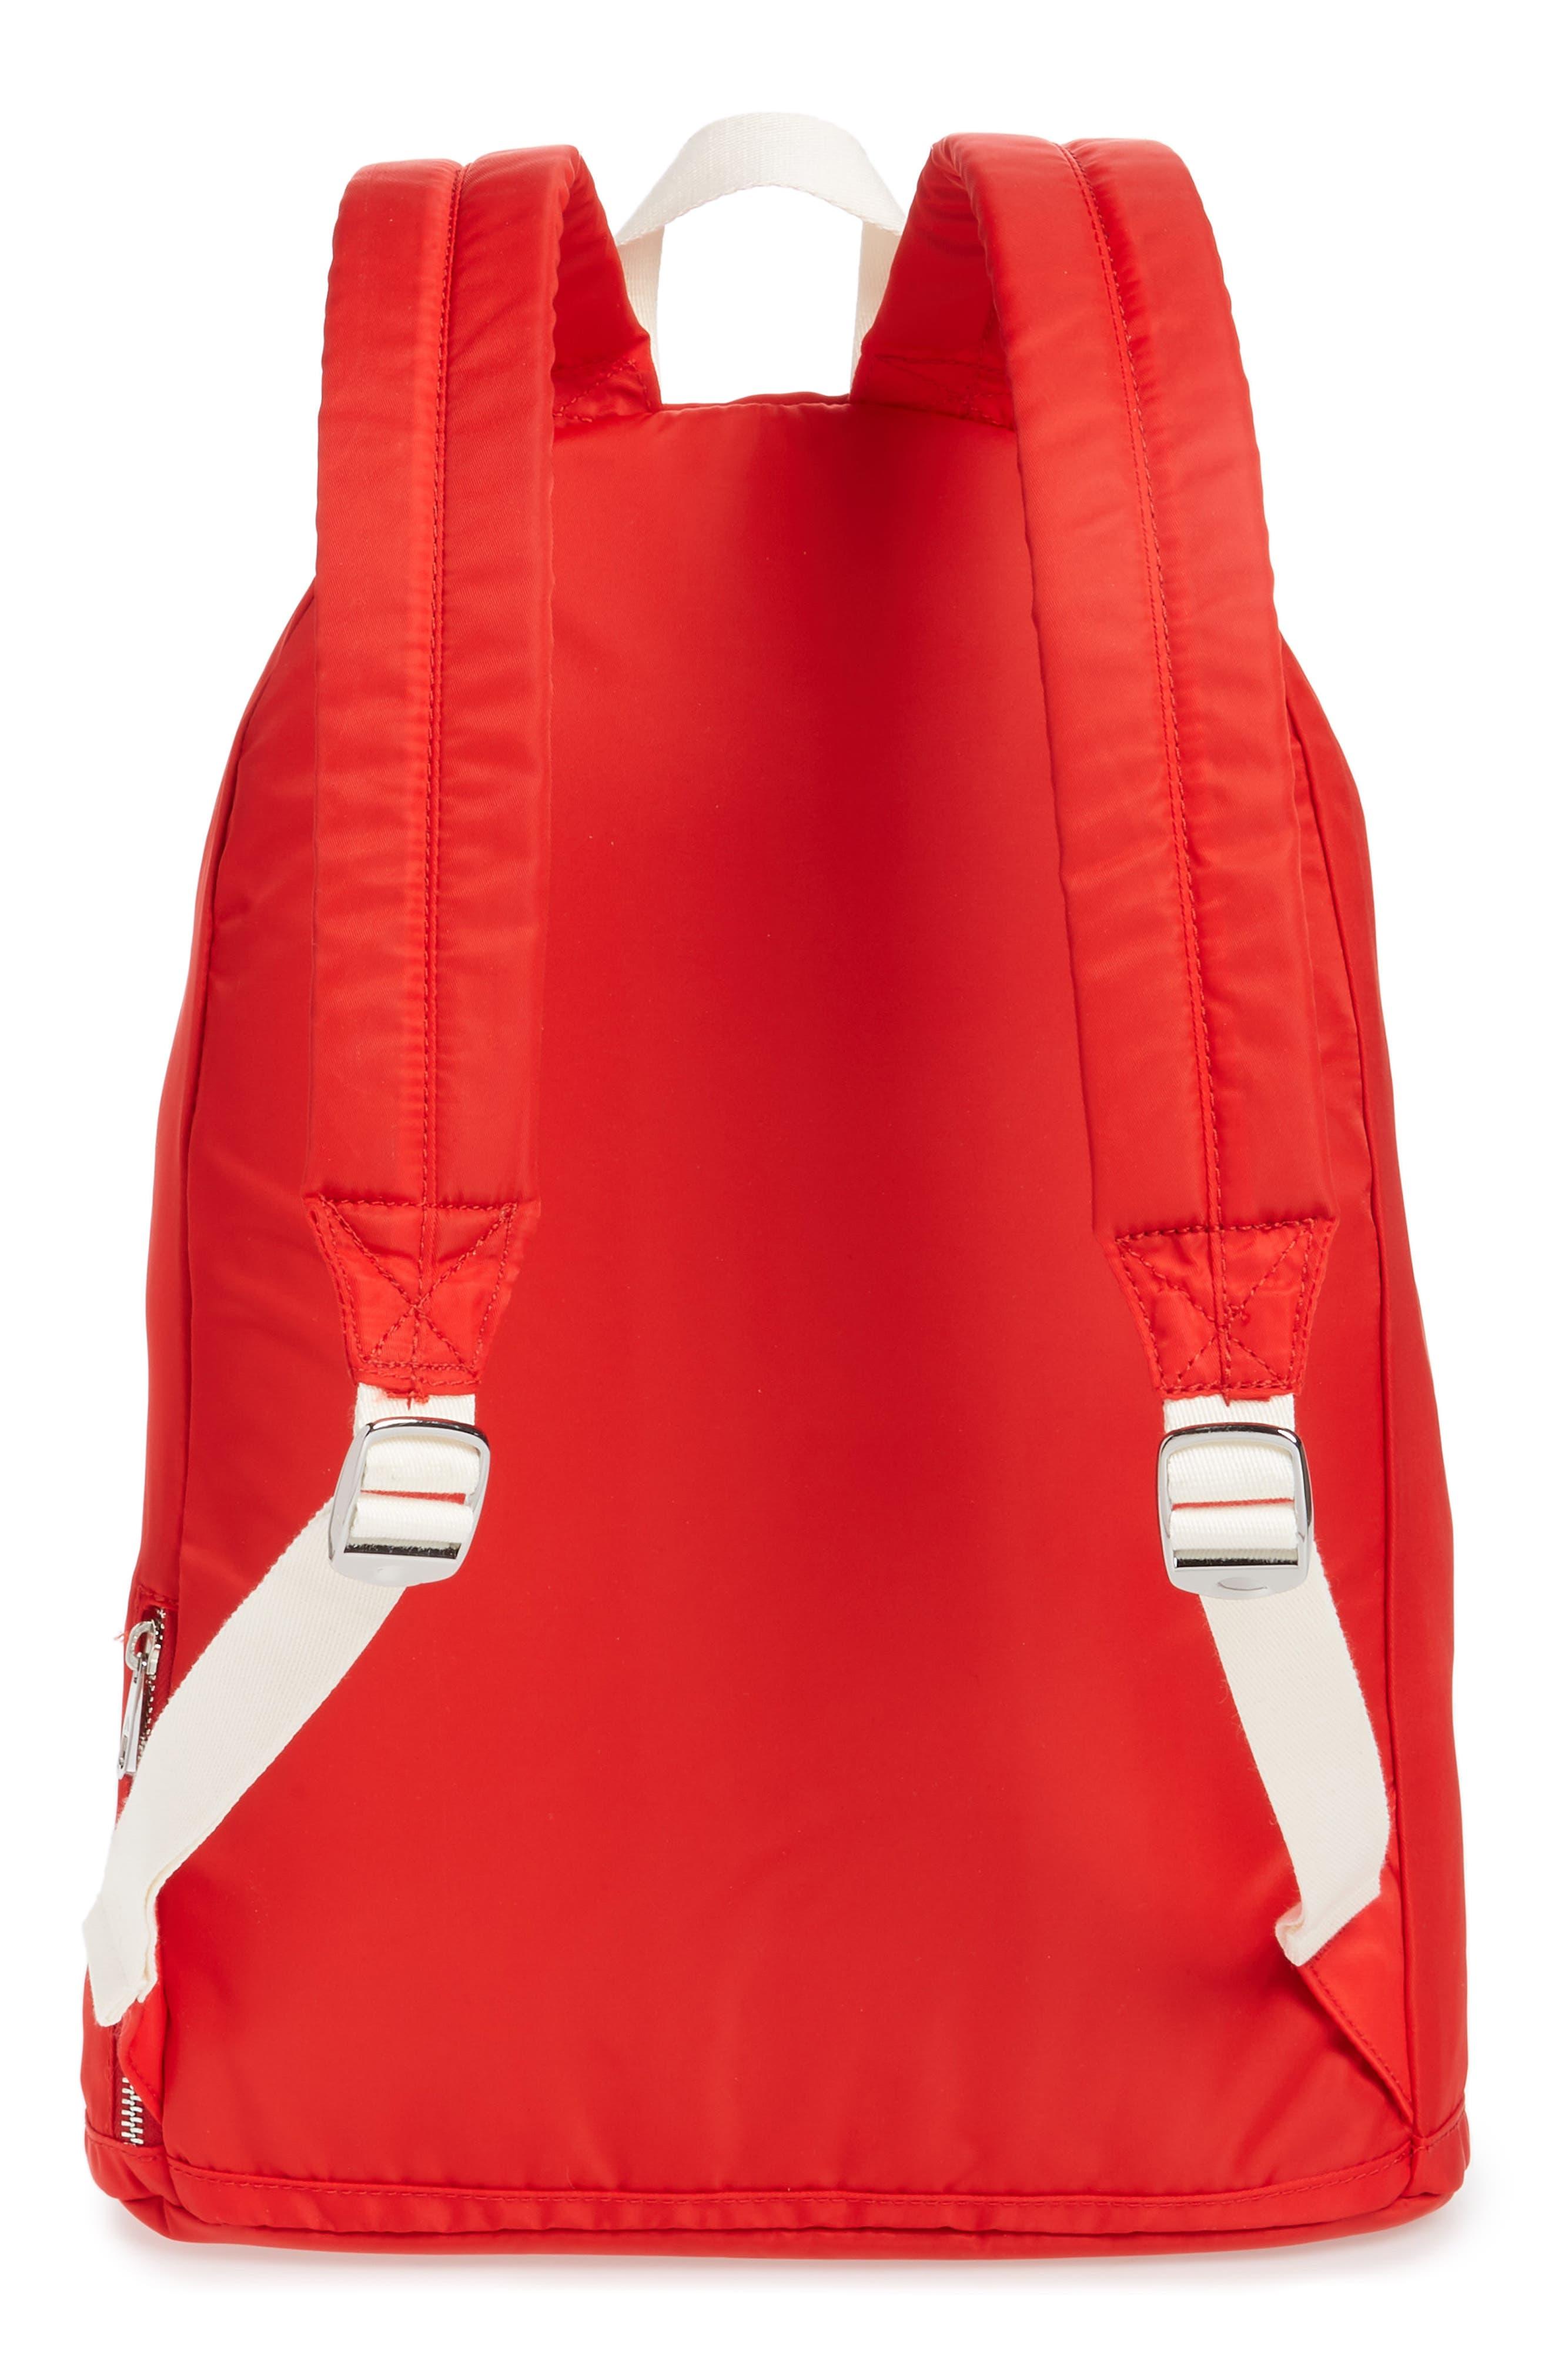 Heights Lorimer Nylon Backpack,                             Alternate thumbnail 3, color,                             RED